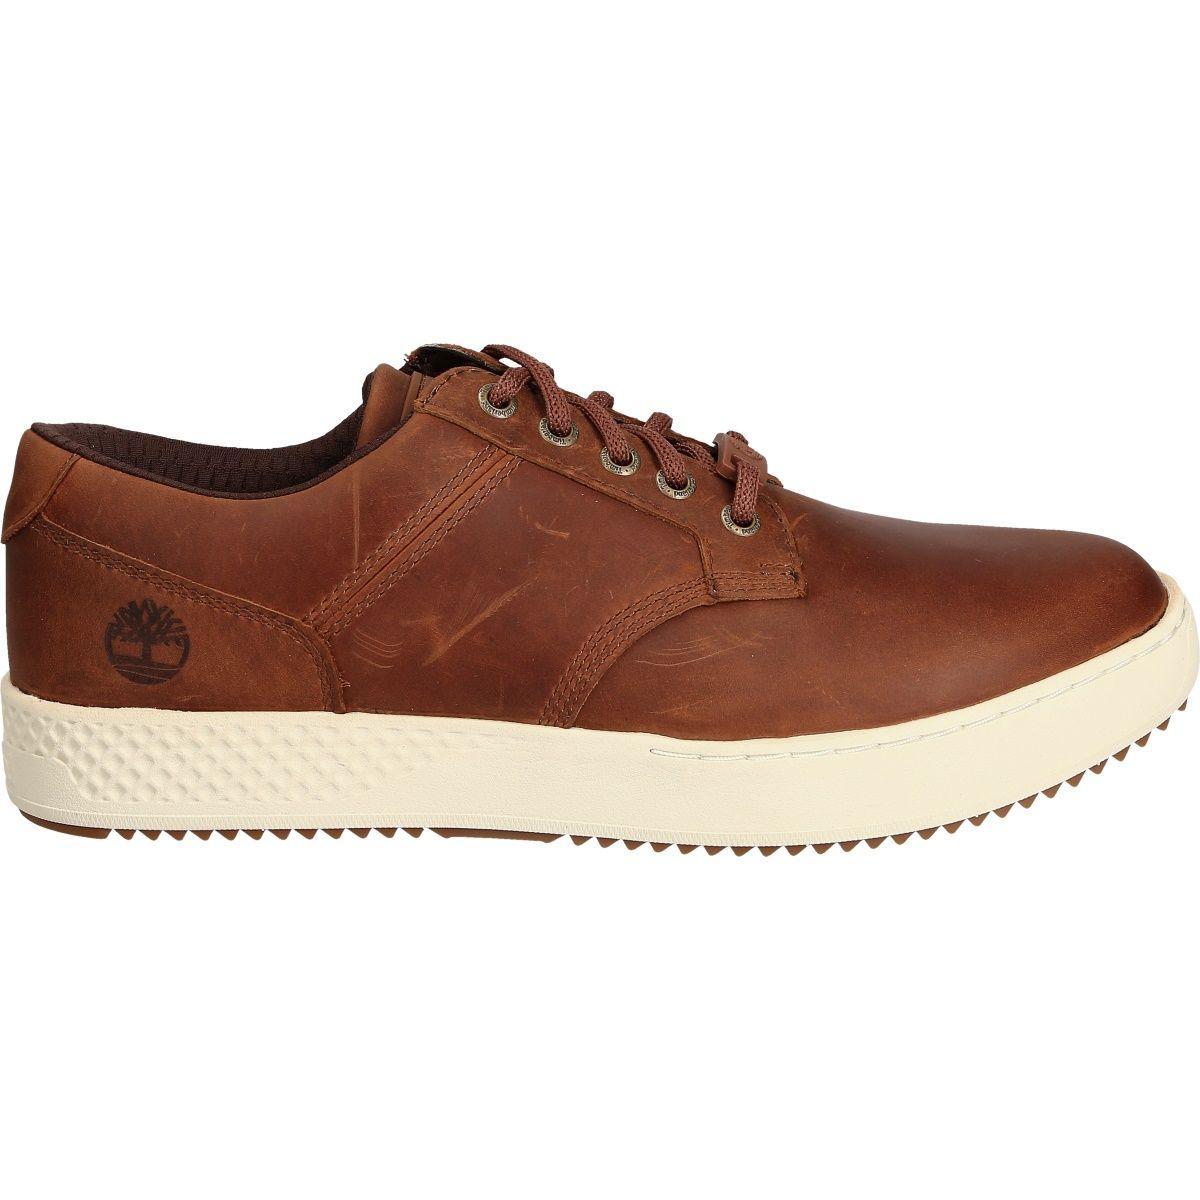 Timberland A1S6W Herren Sneakers: : Schuhe